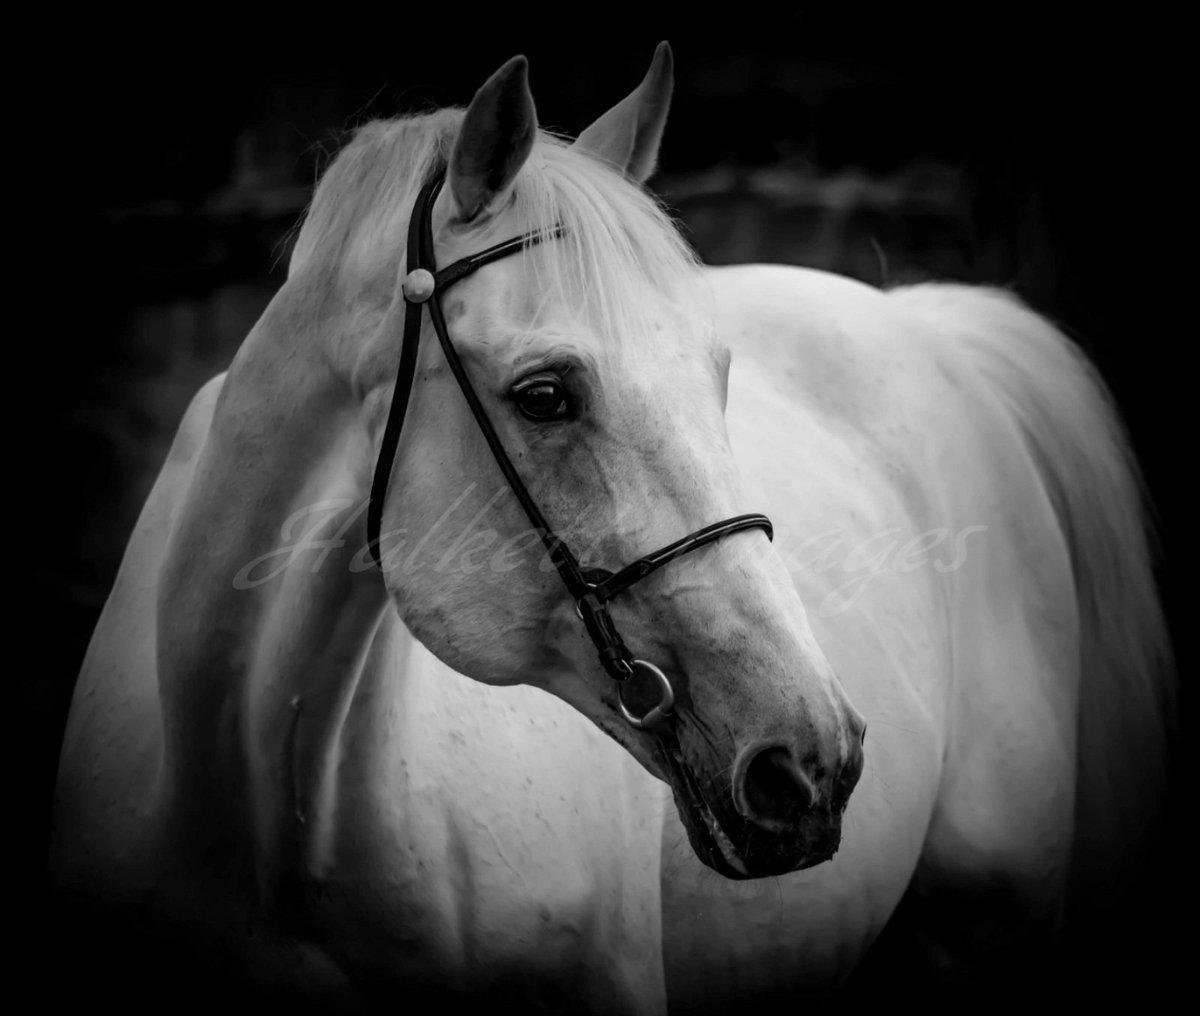 The stallion Silverstone #showjumper #stallion #scotlandaiservices #photography #photographer #horse #feipic.twitter.com/SxJuhwEhxq